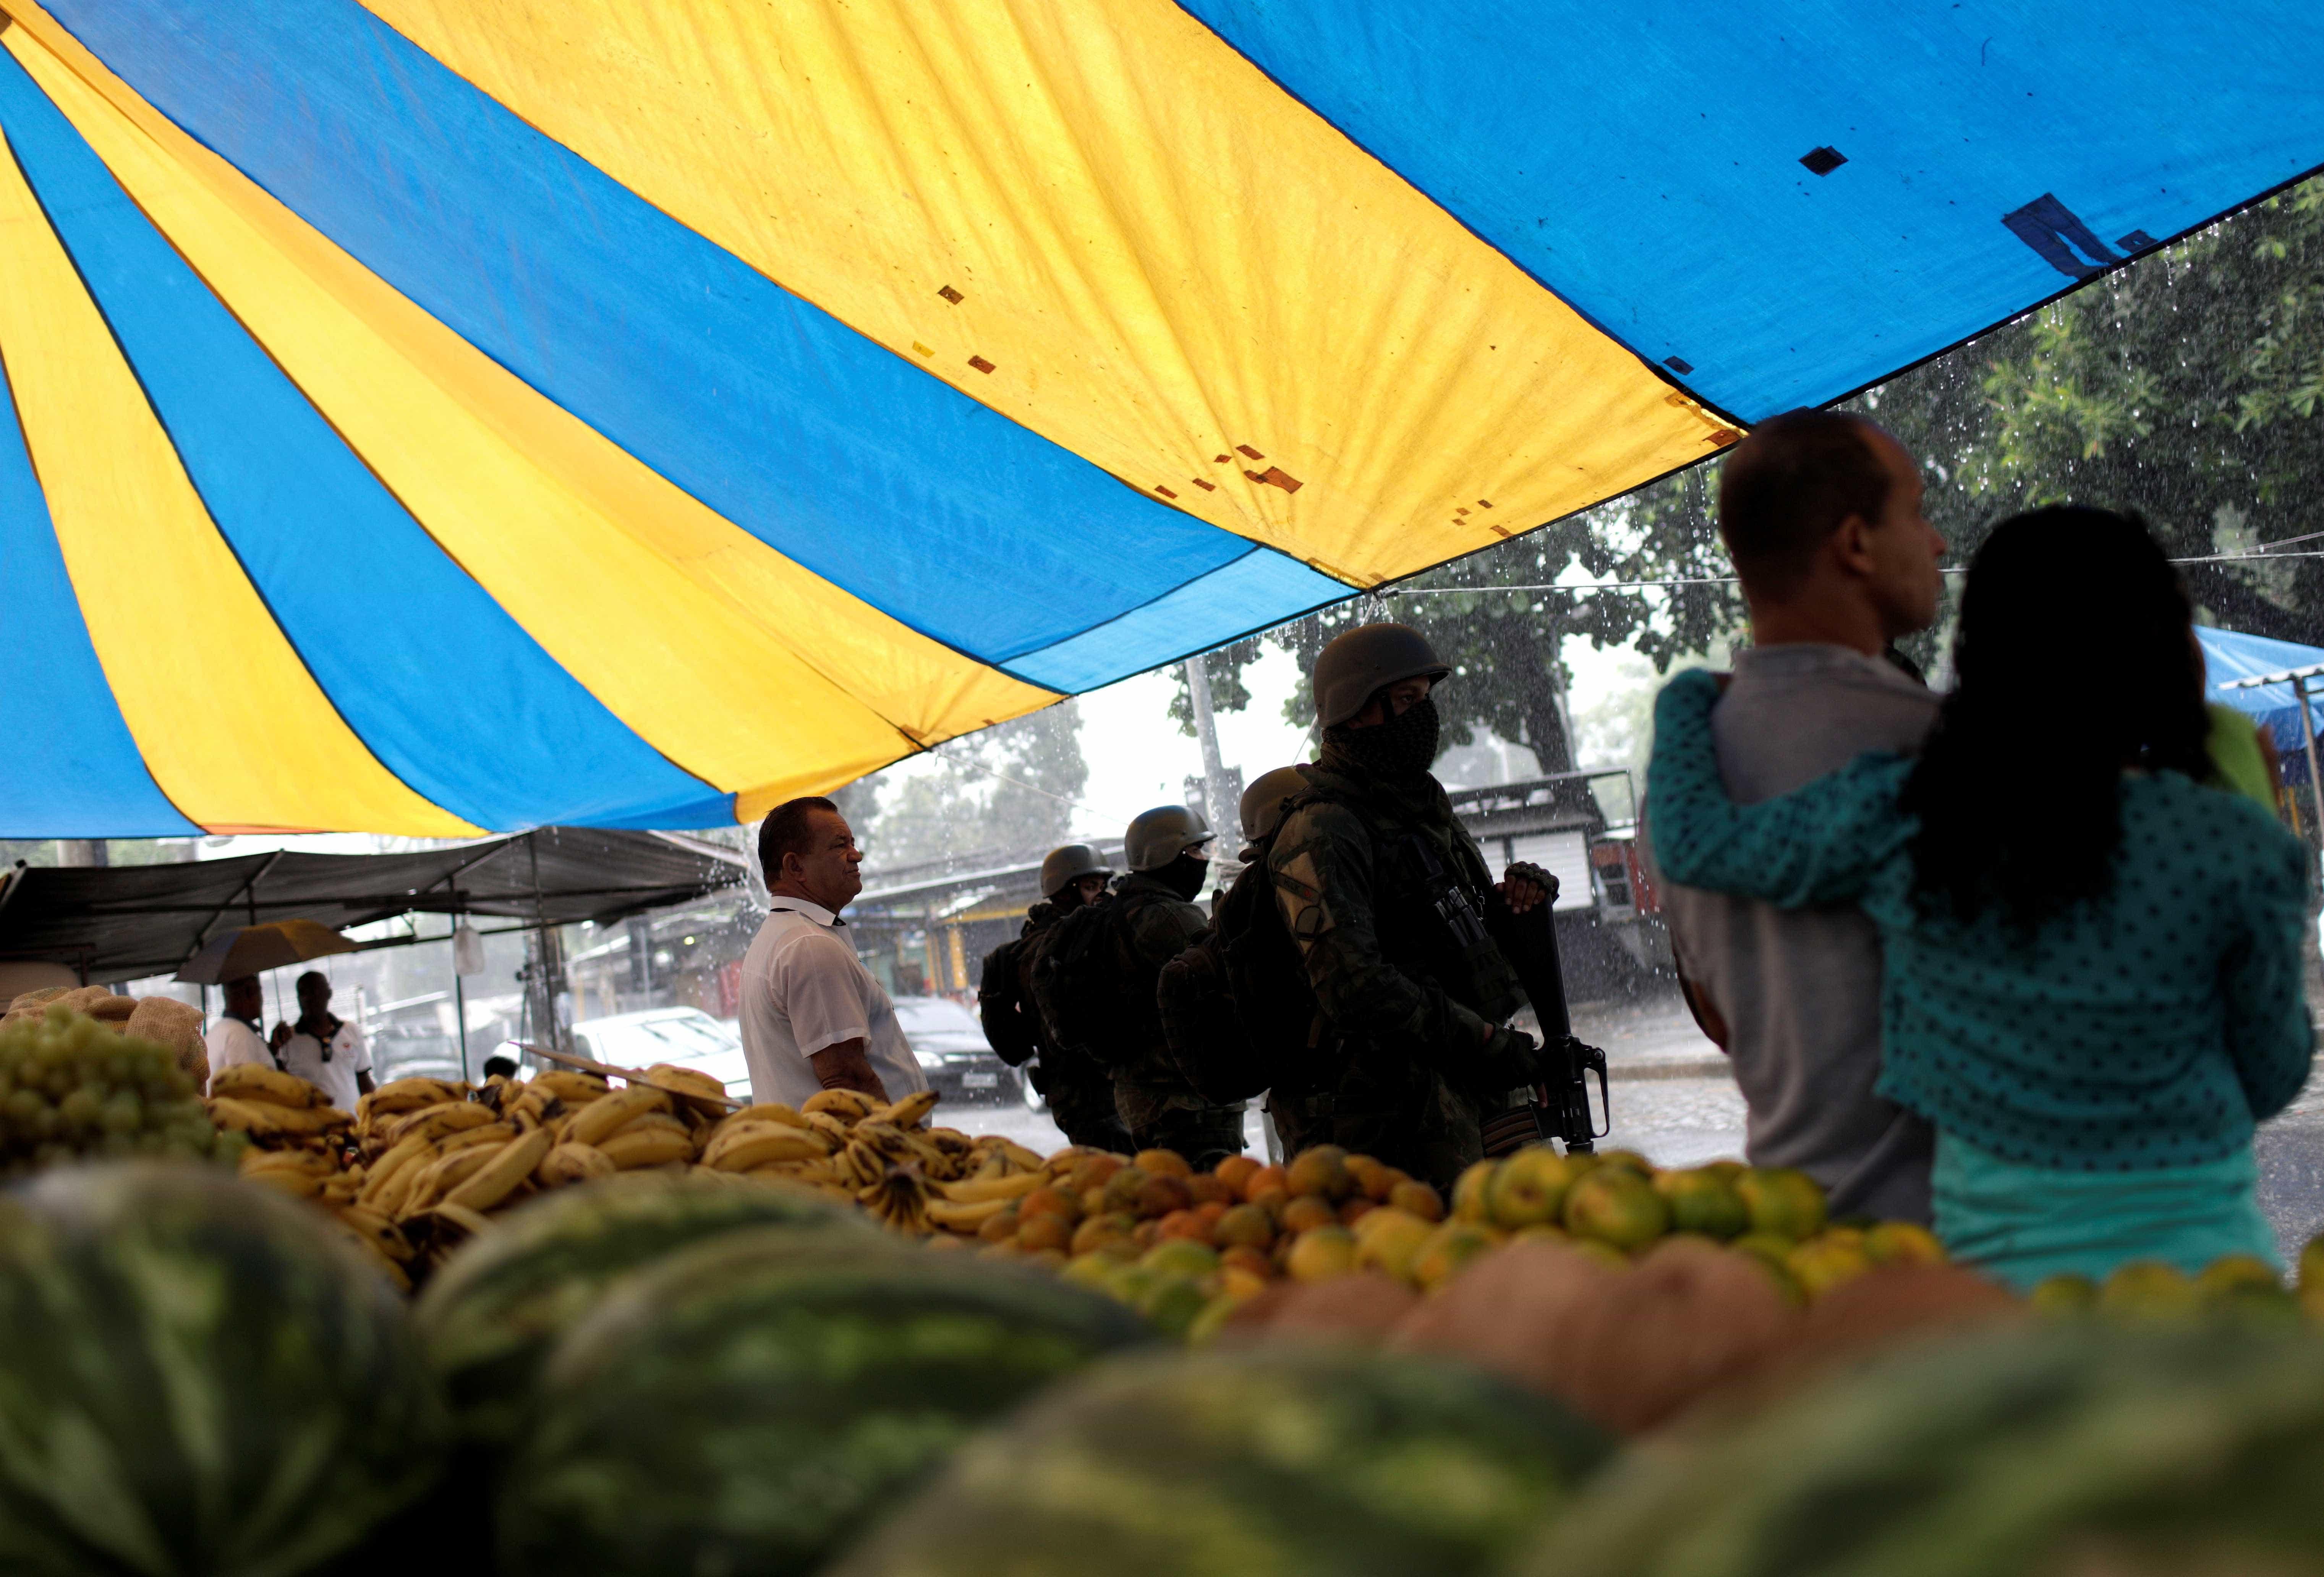 Prefeitura do Rio promete reconstruir feira na Vila Kennedy